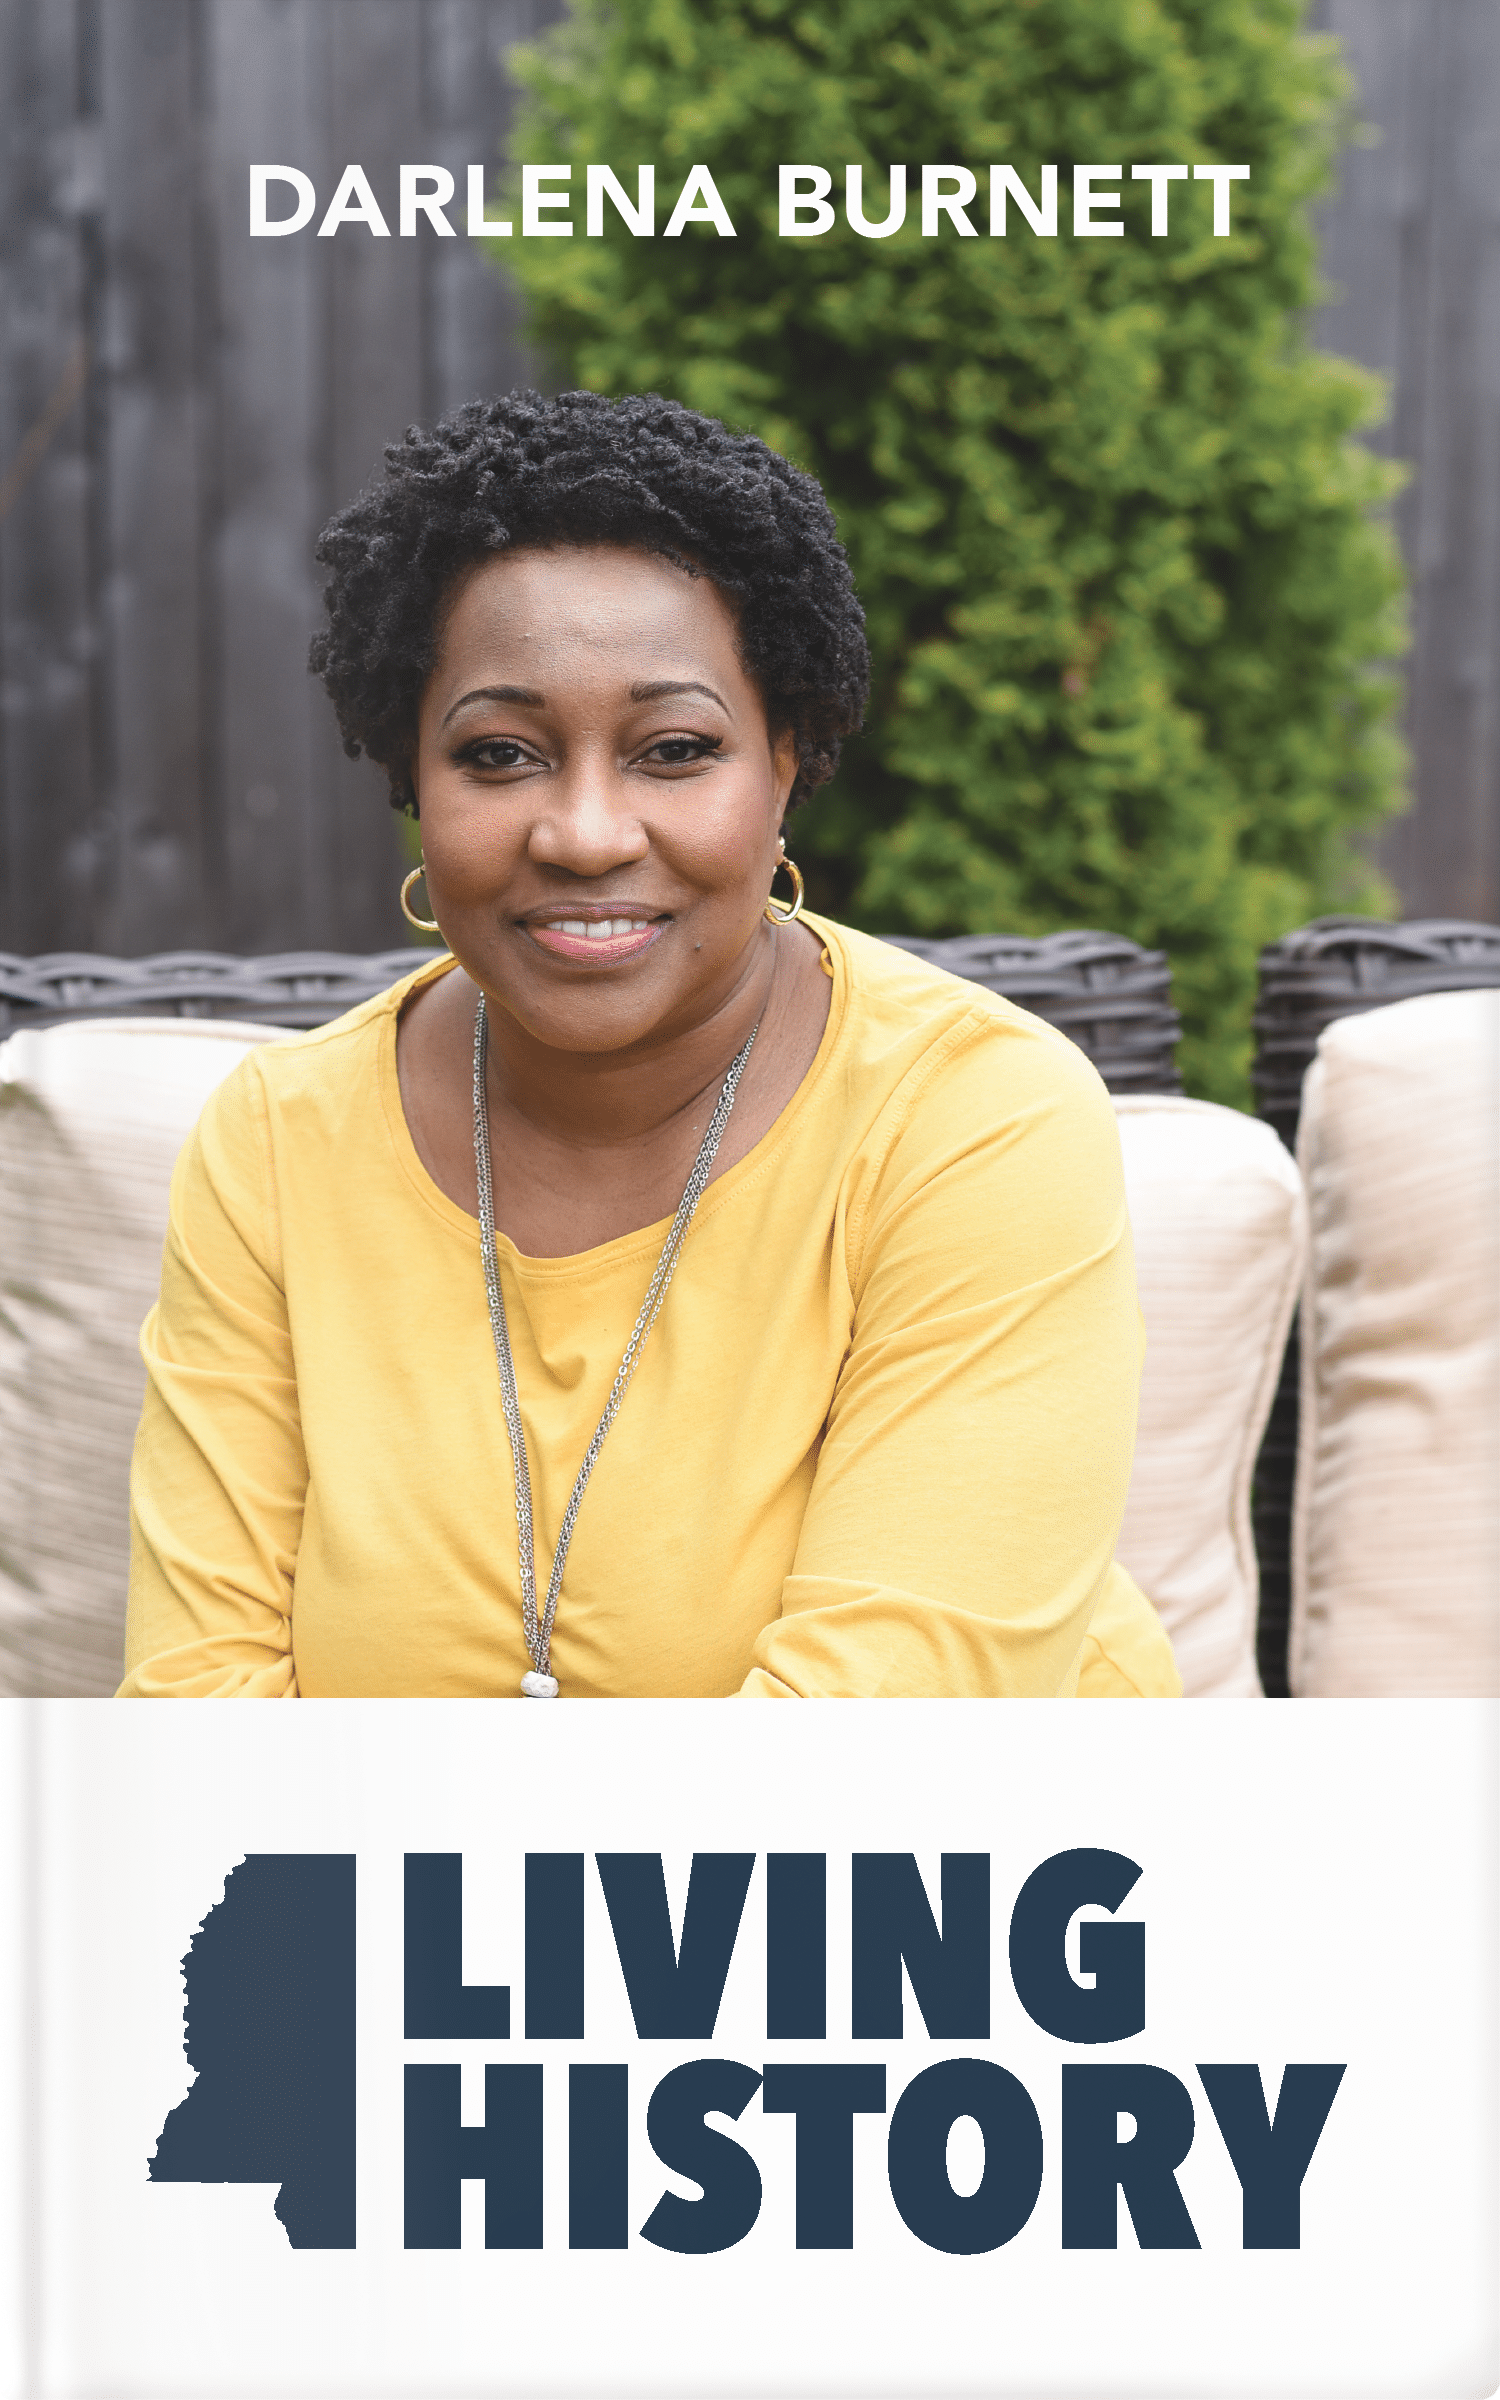 Living History by Darlena Burnett